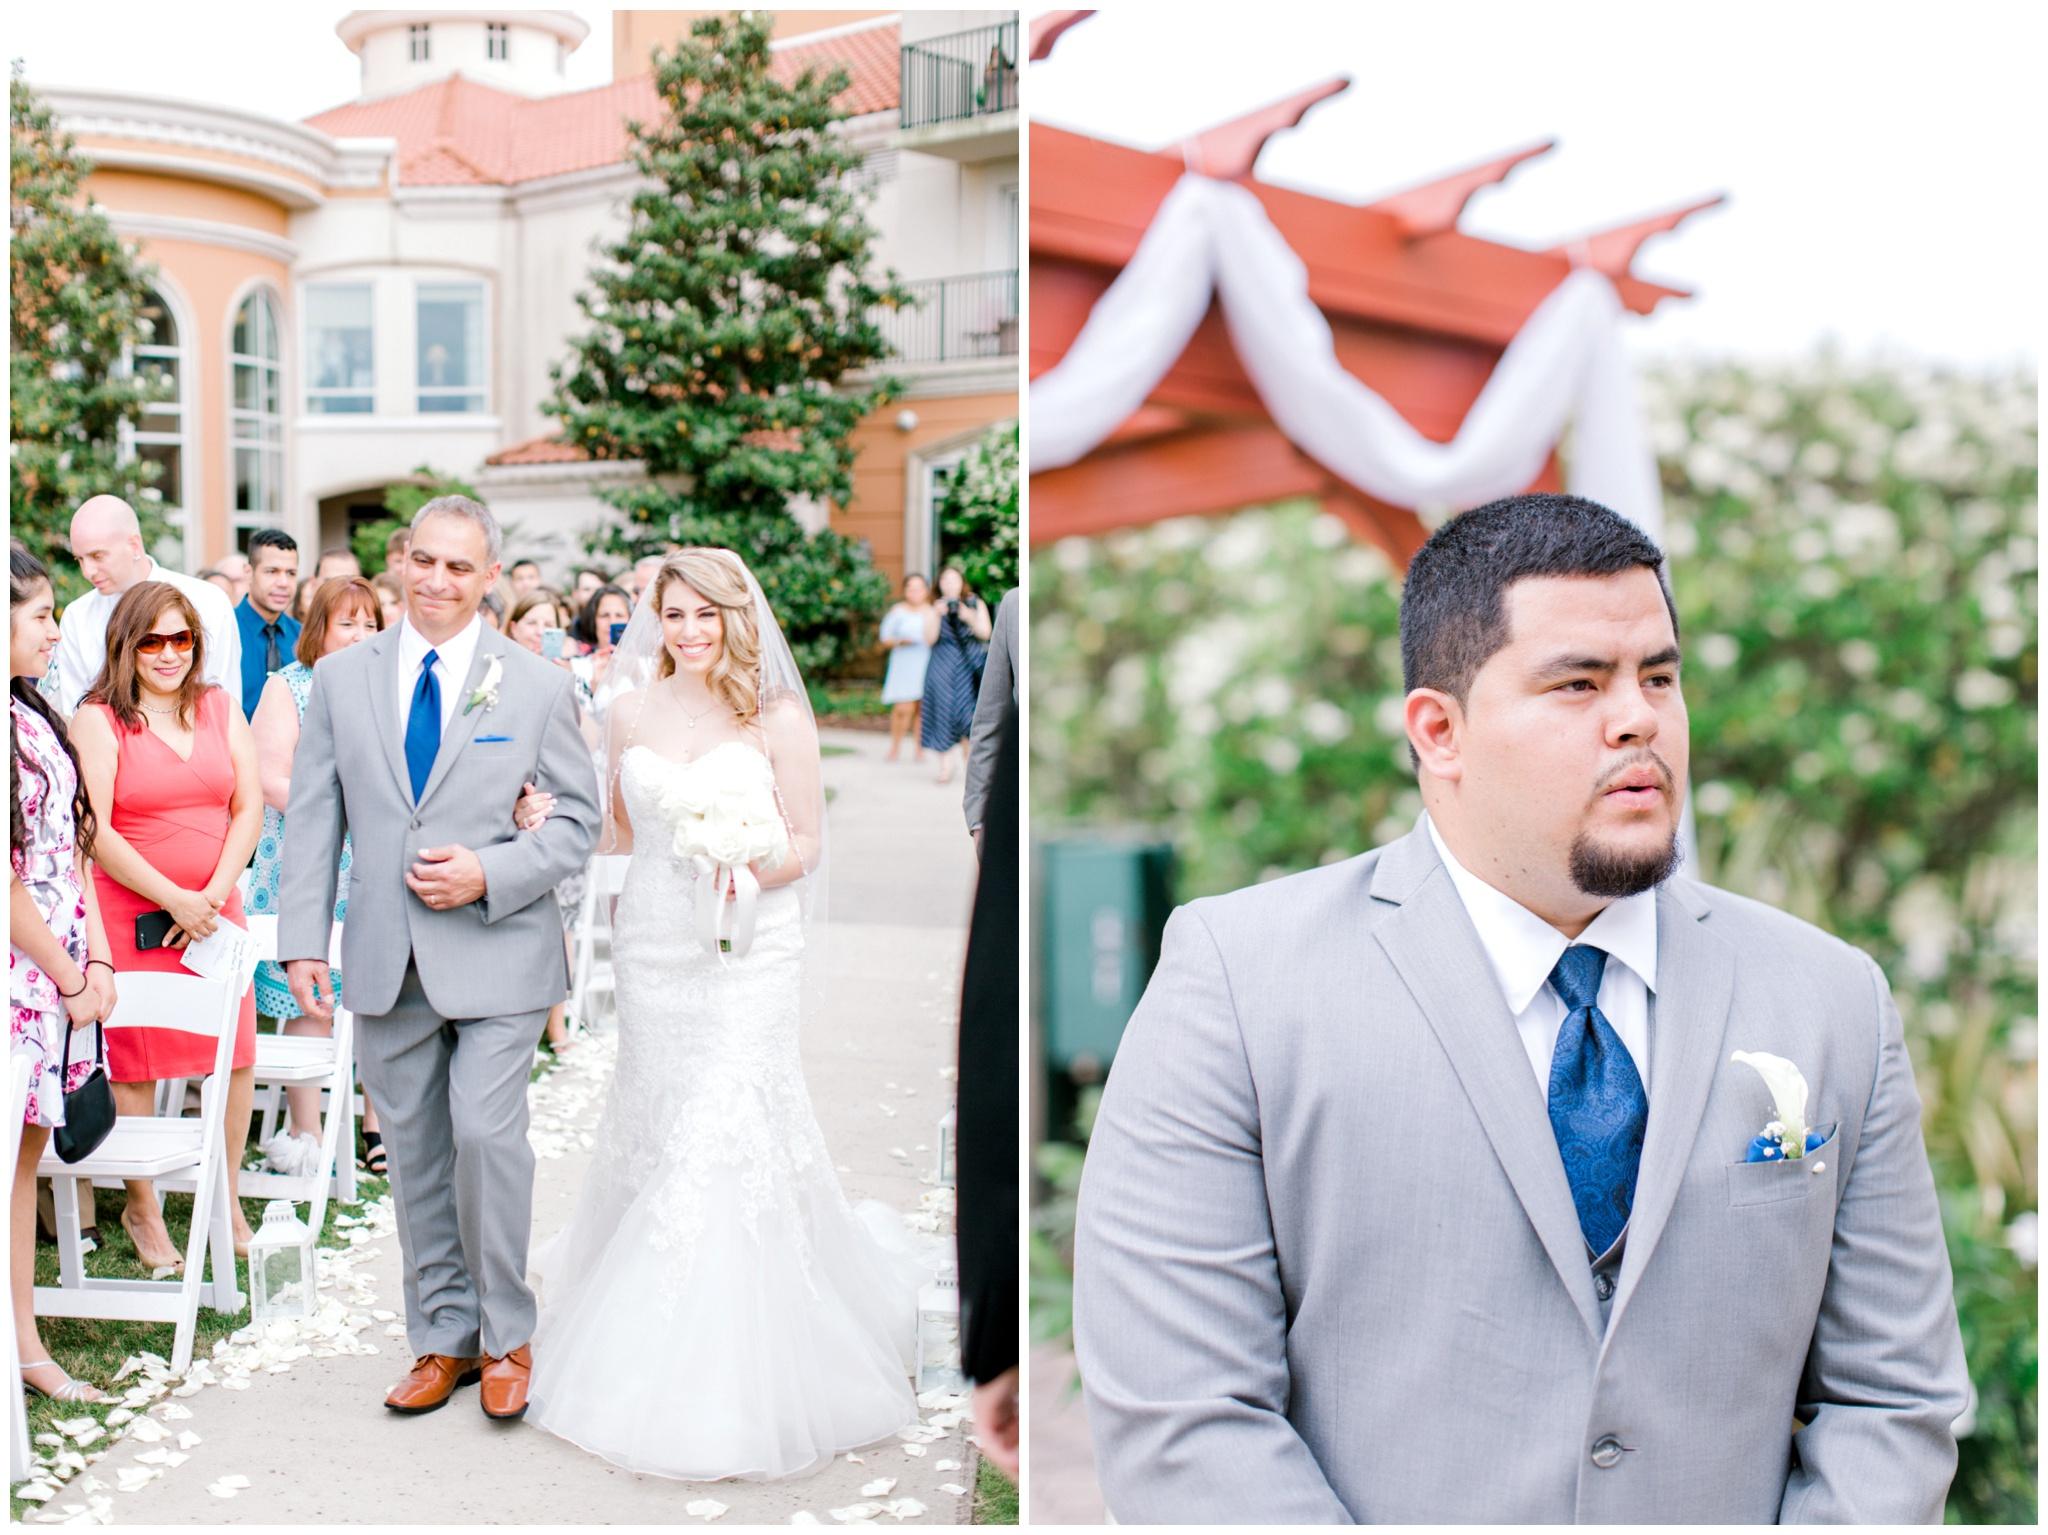 south-carolina-wedding-photographer-77